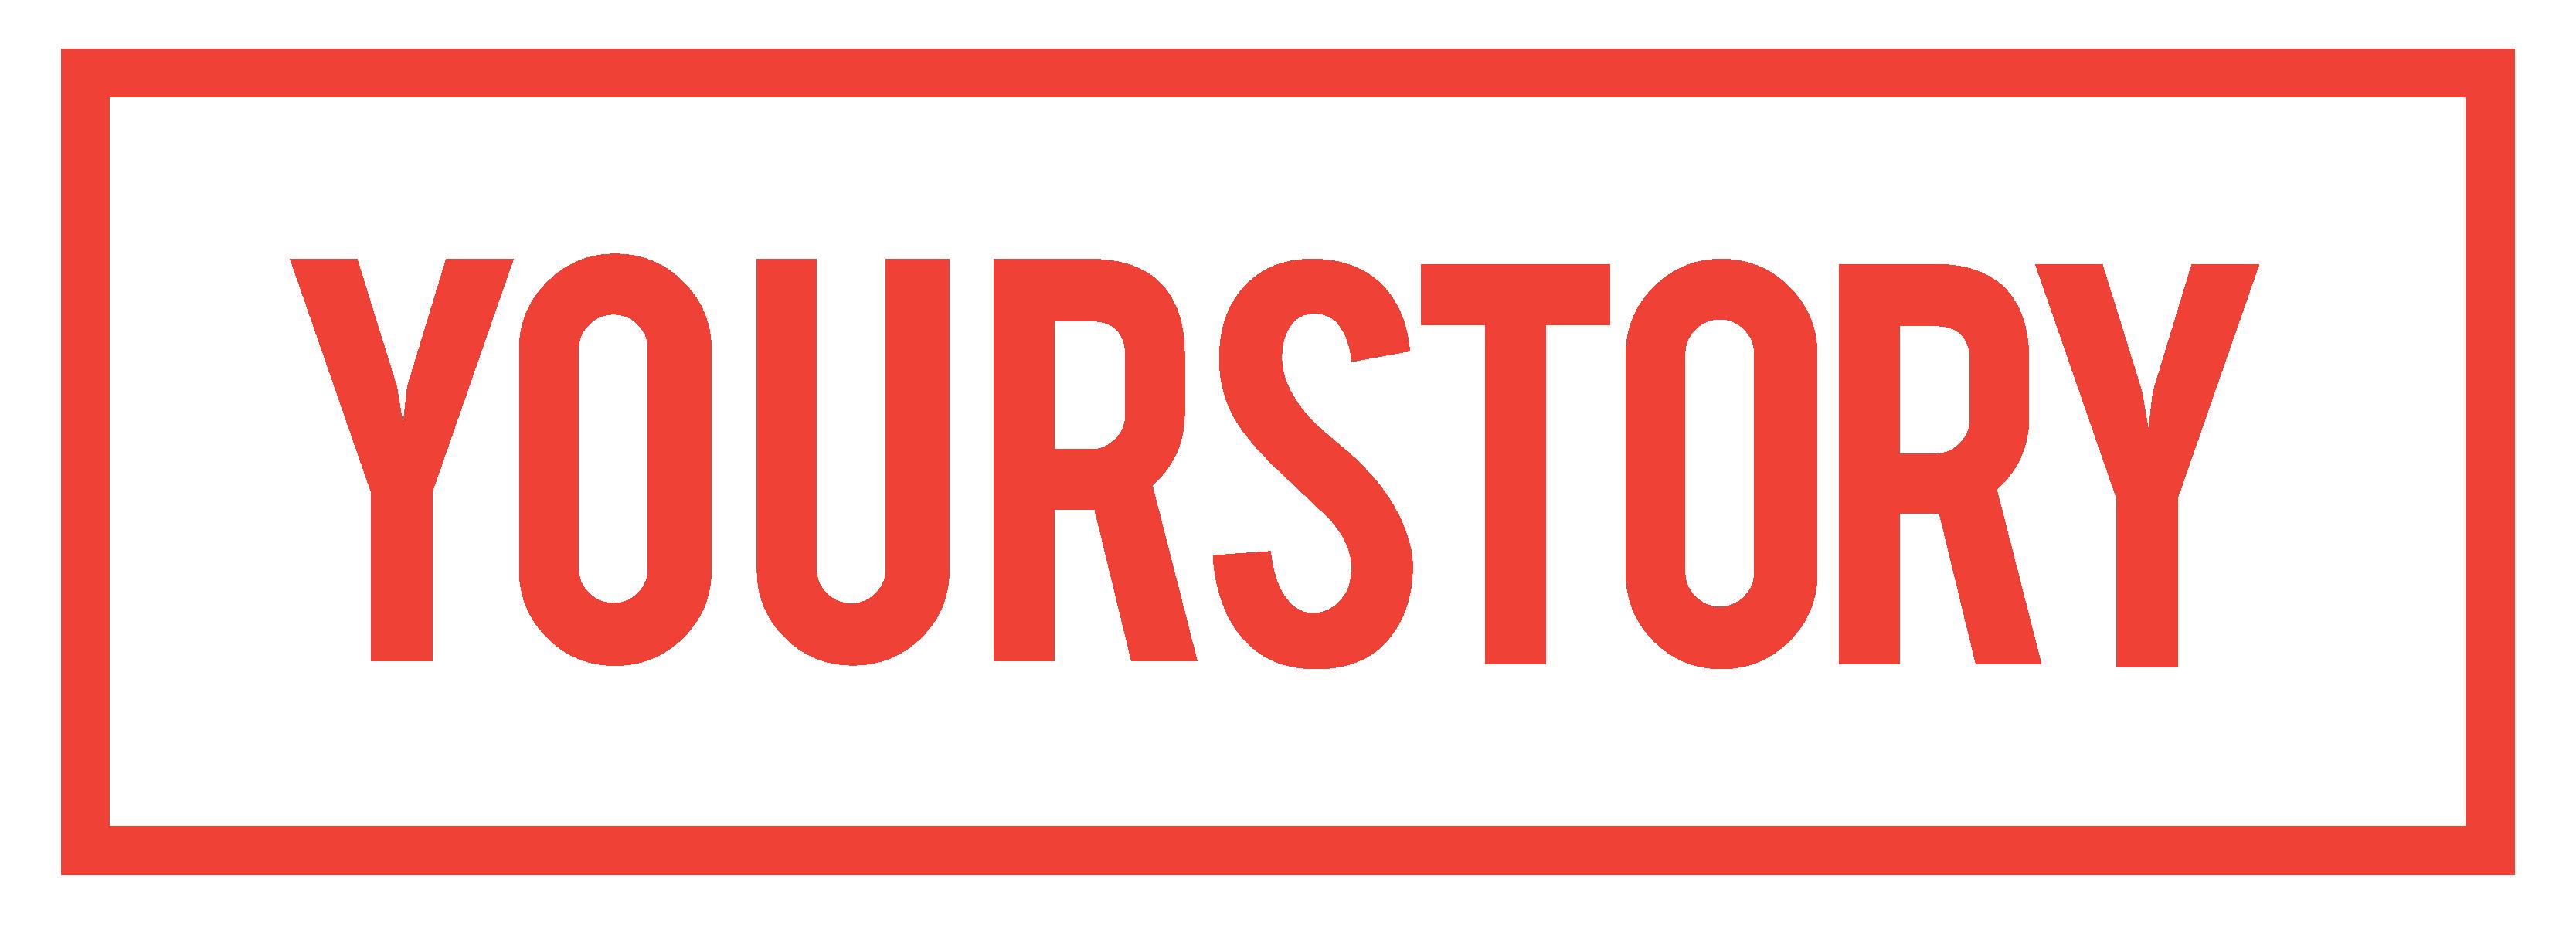 YourStory | Stories about startups, entrepreneurship, women, social